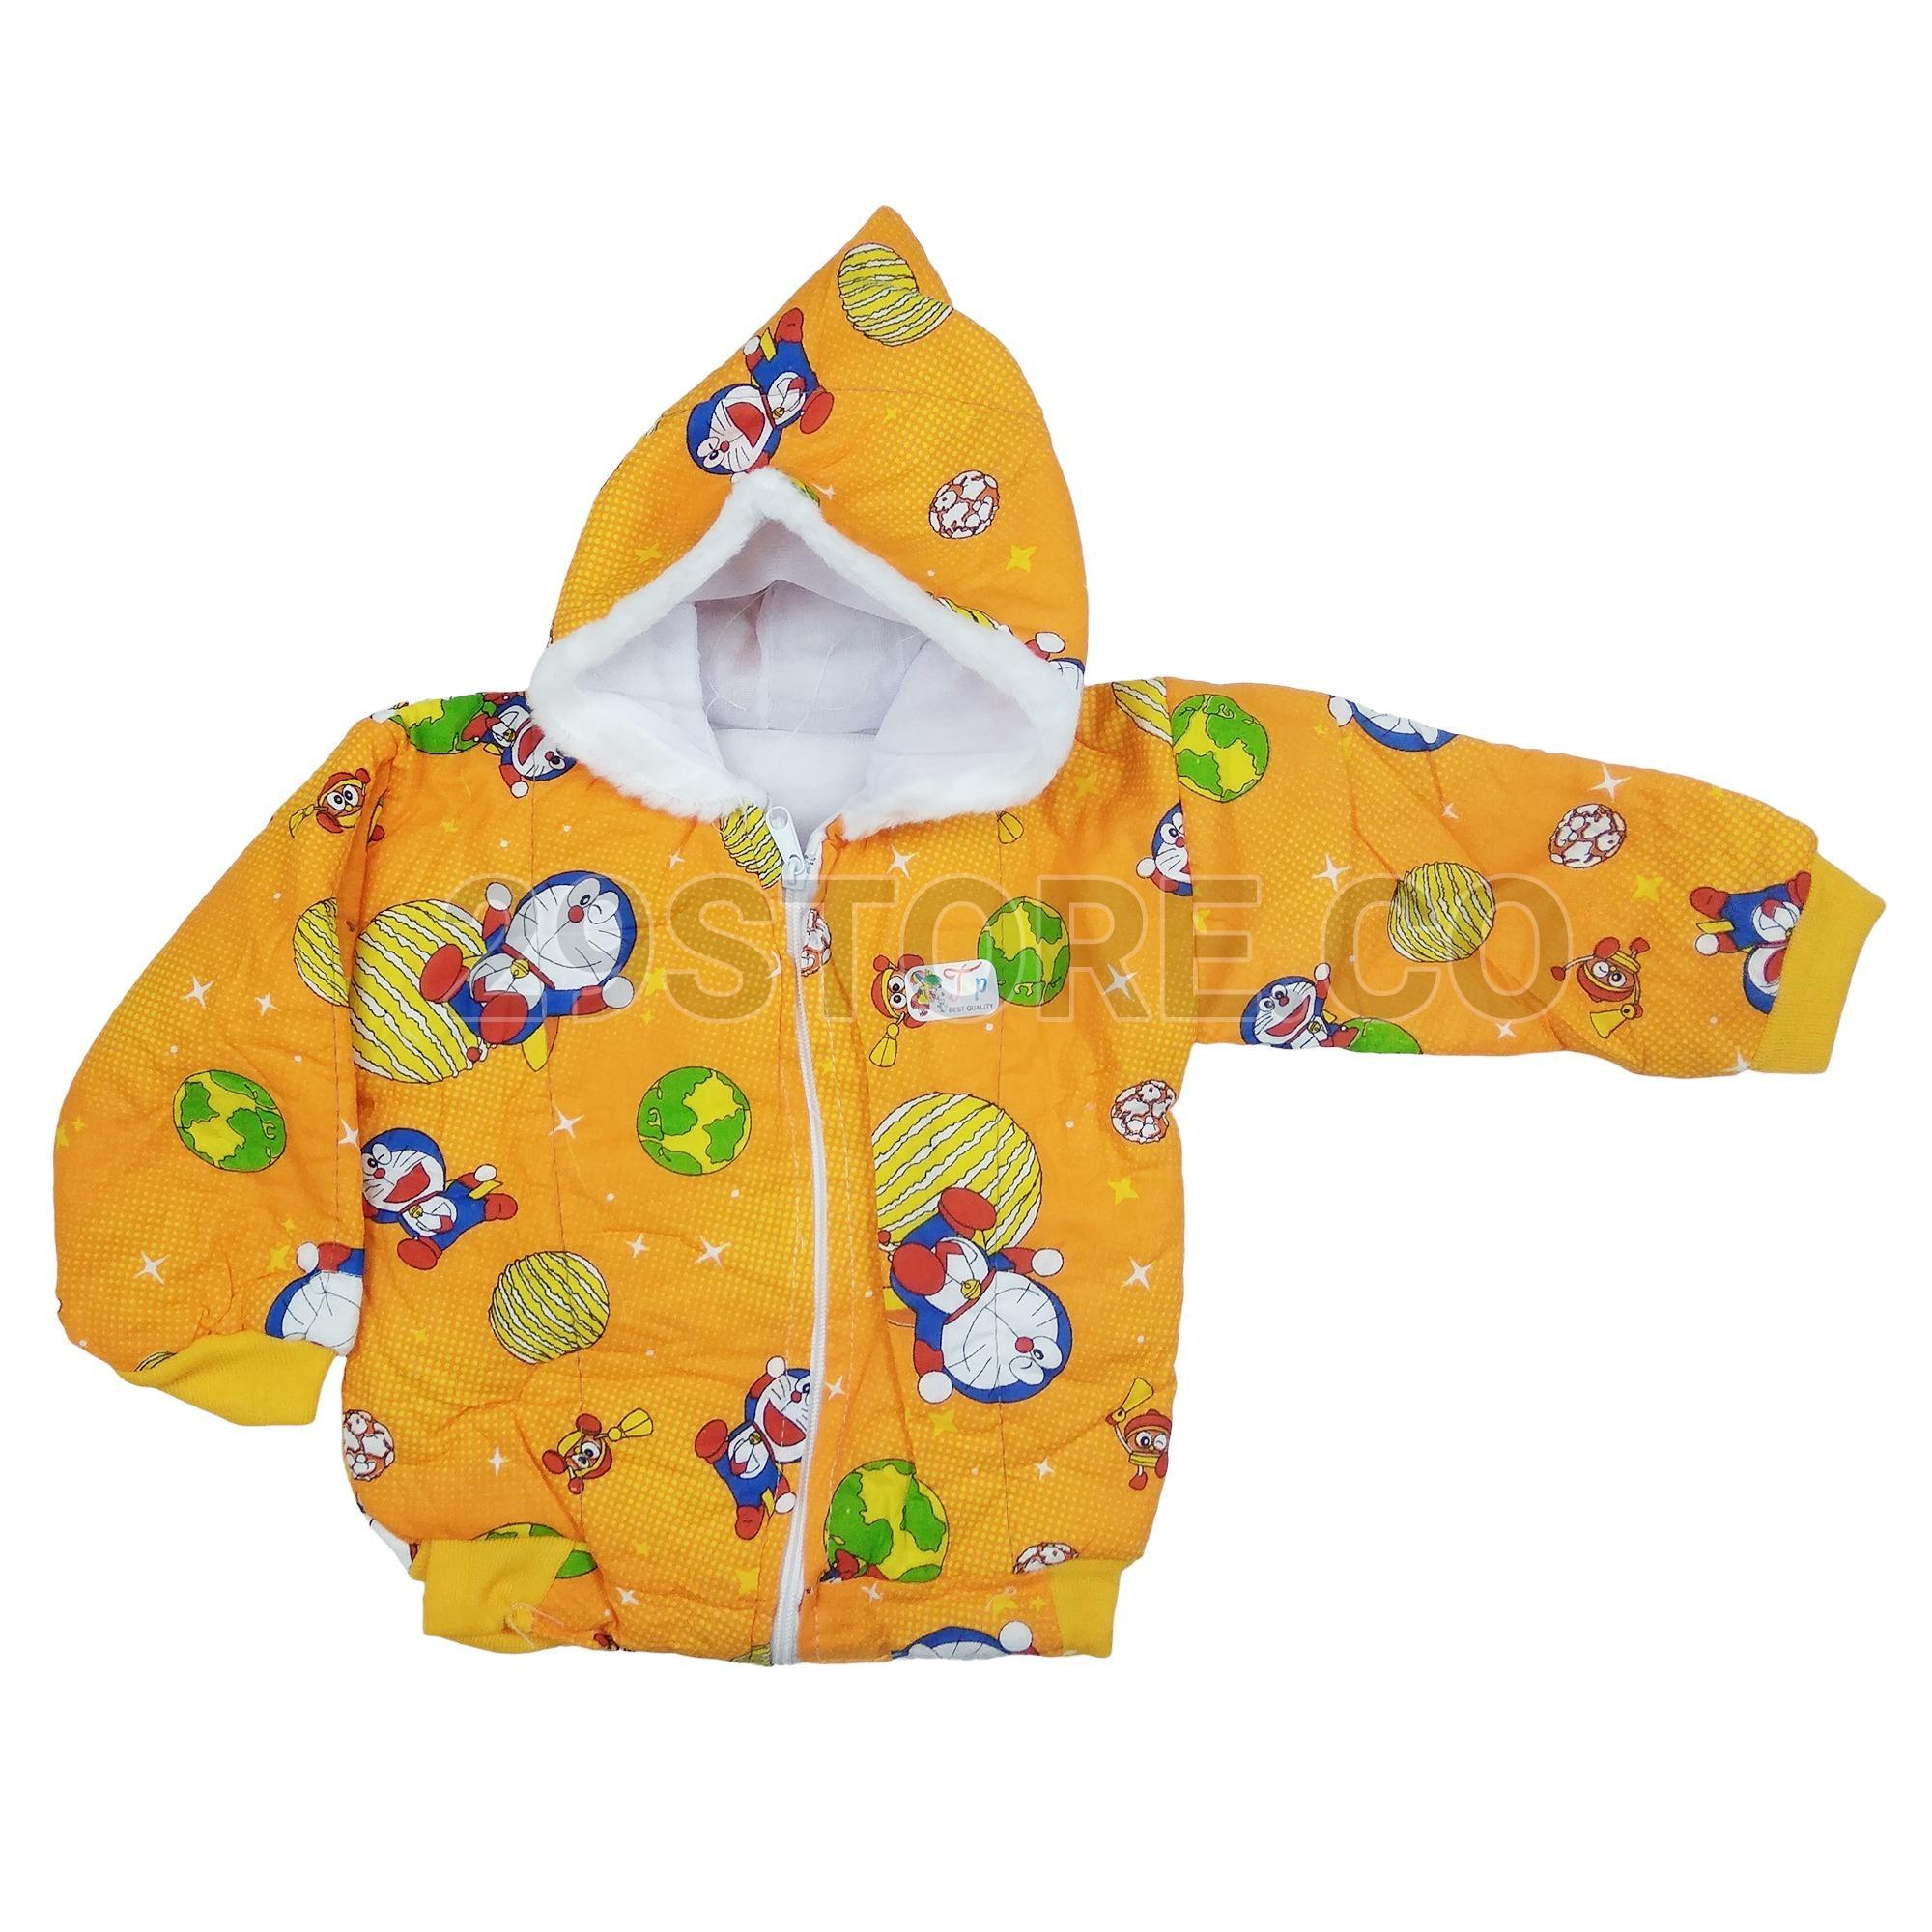 Jaket Hoodie Bulu Anak Bayi Cewek Perempuan Cowok Laki-Laki Motif